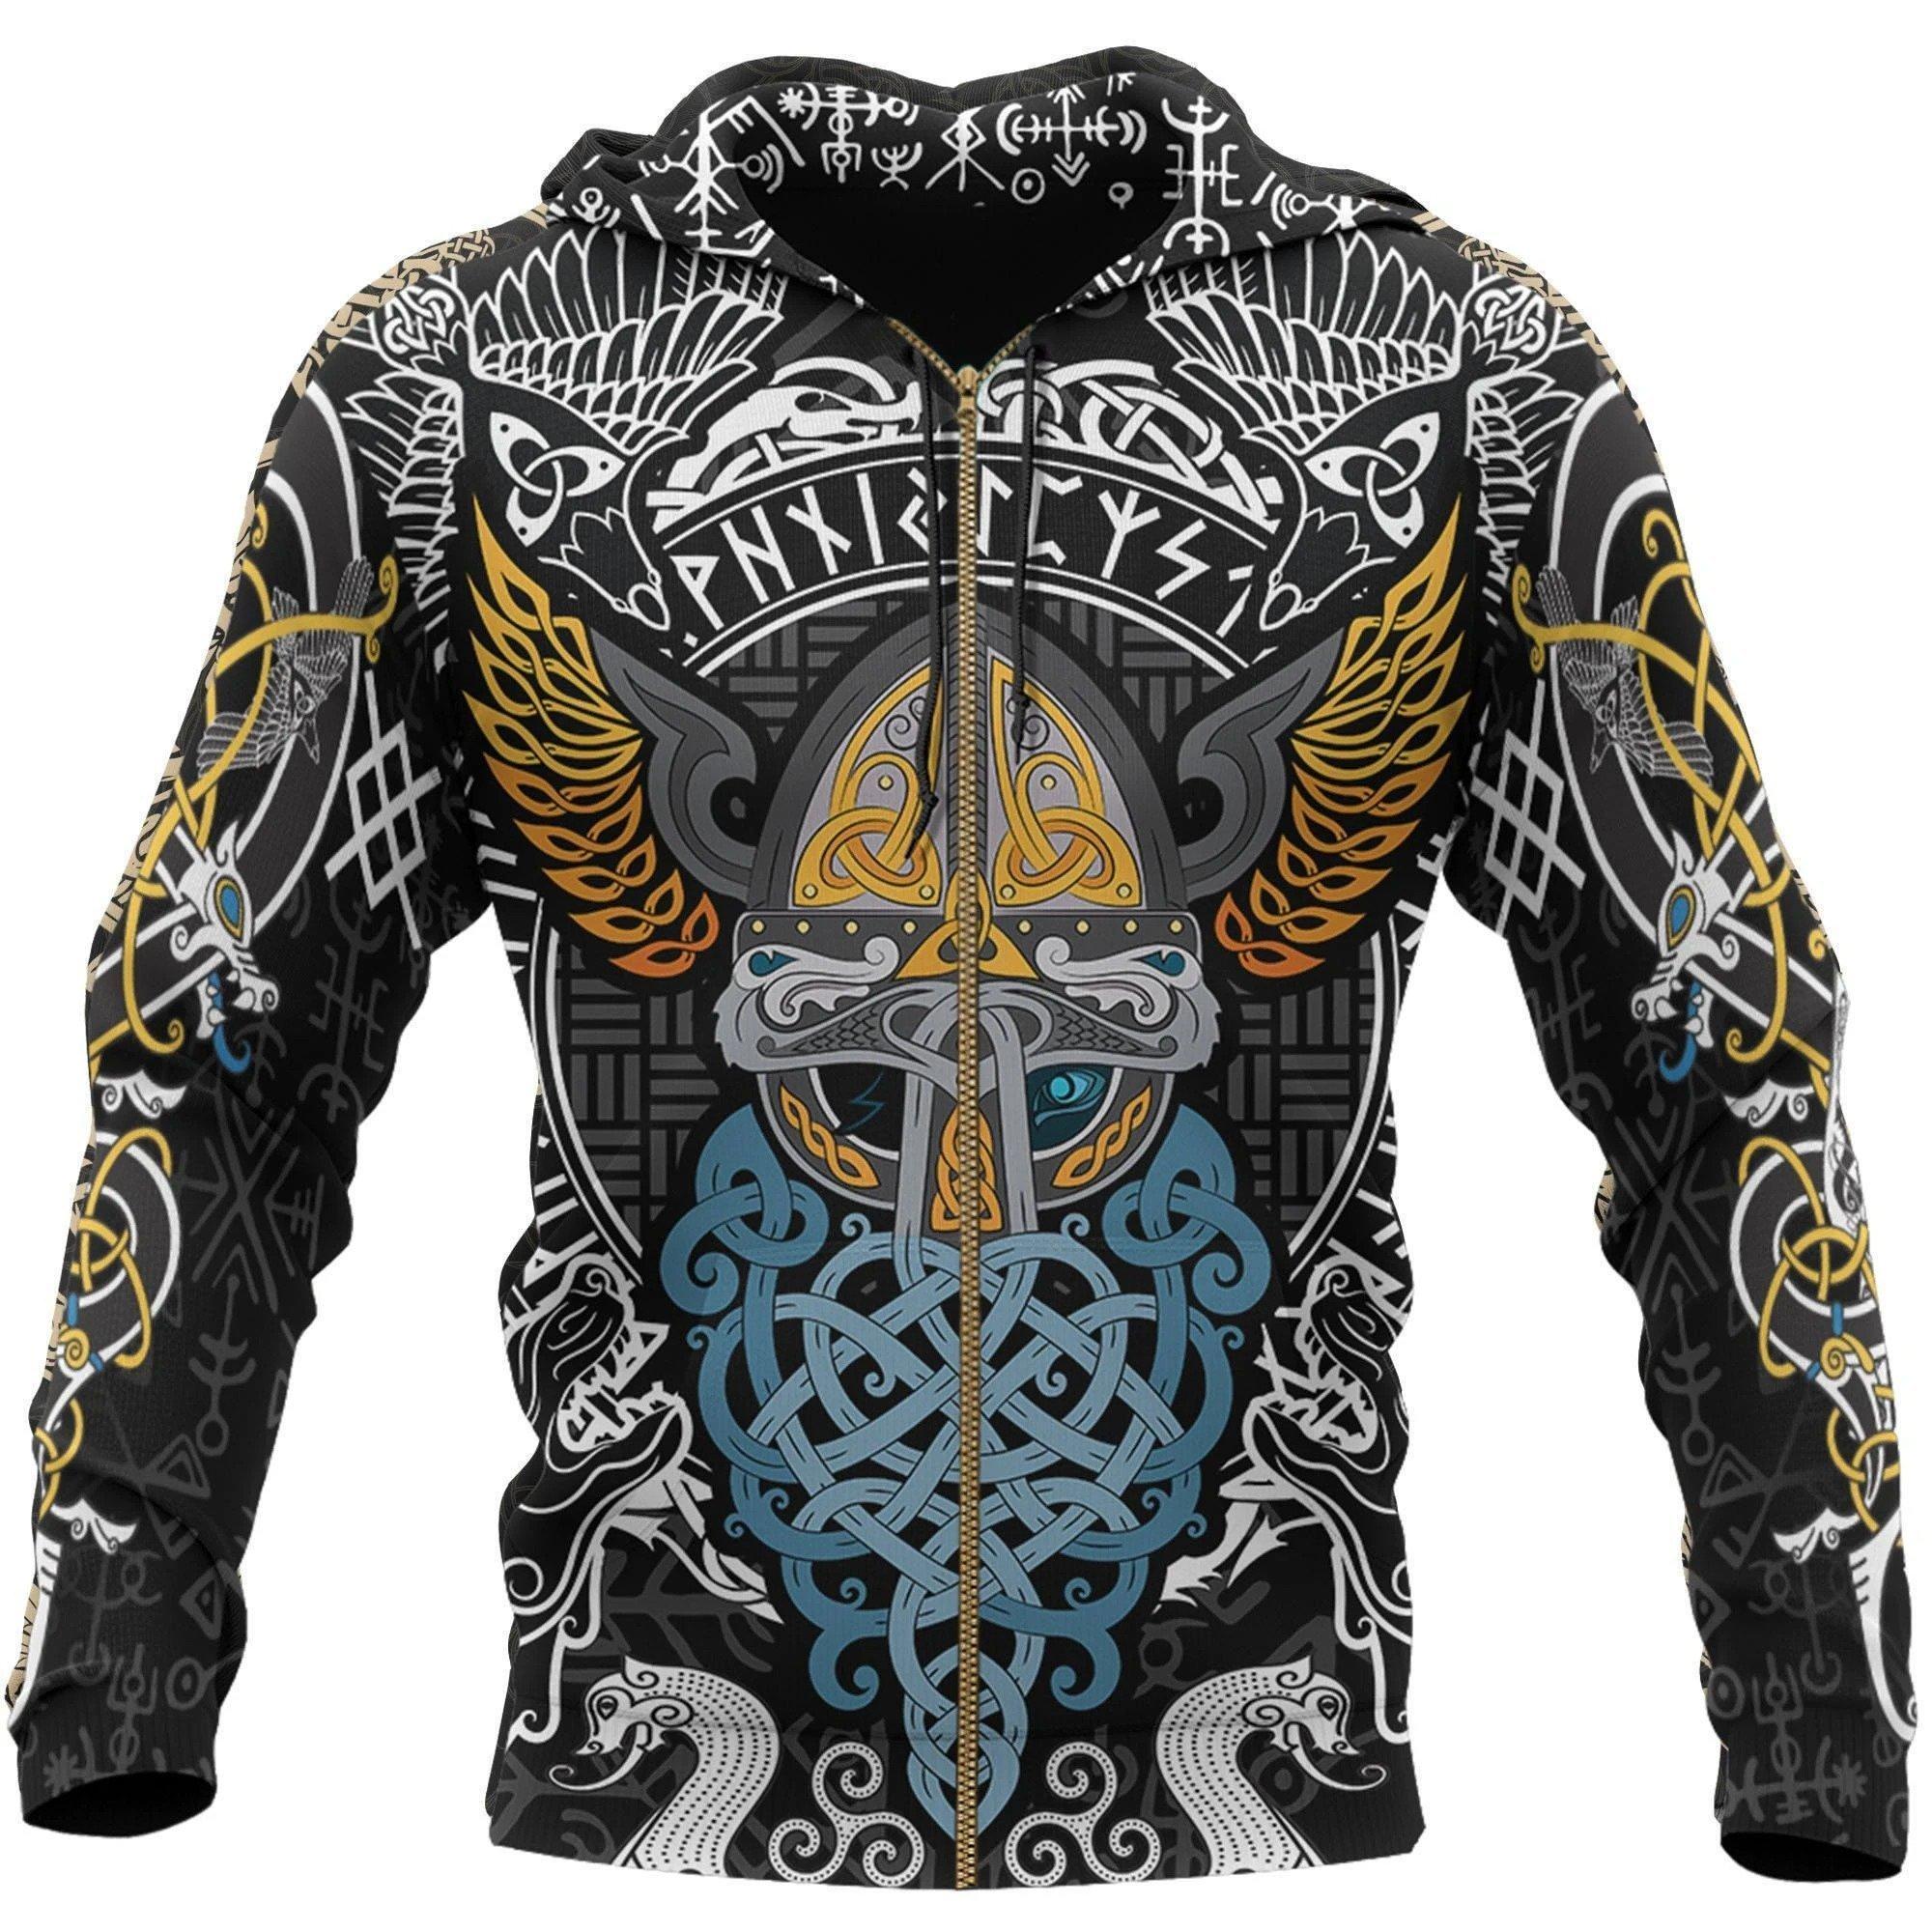 viking odin wotan tattoo all over printed zip hoodie